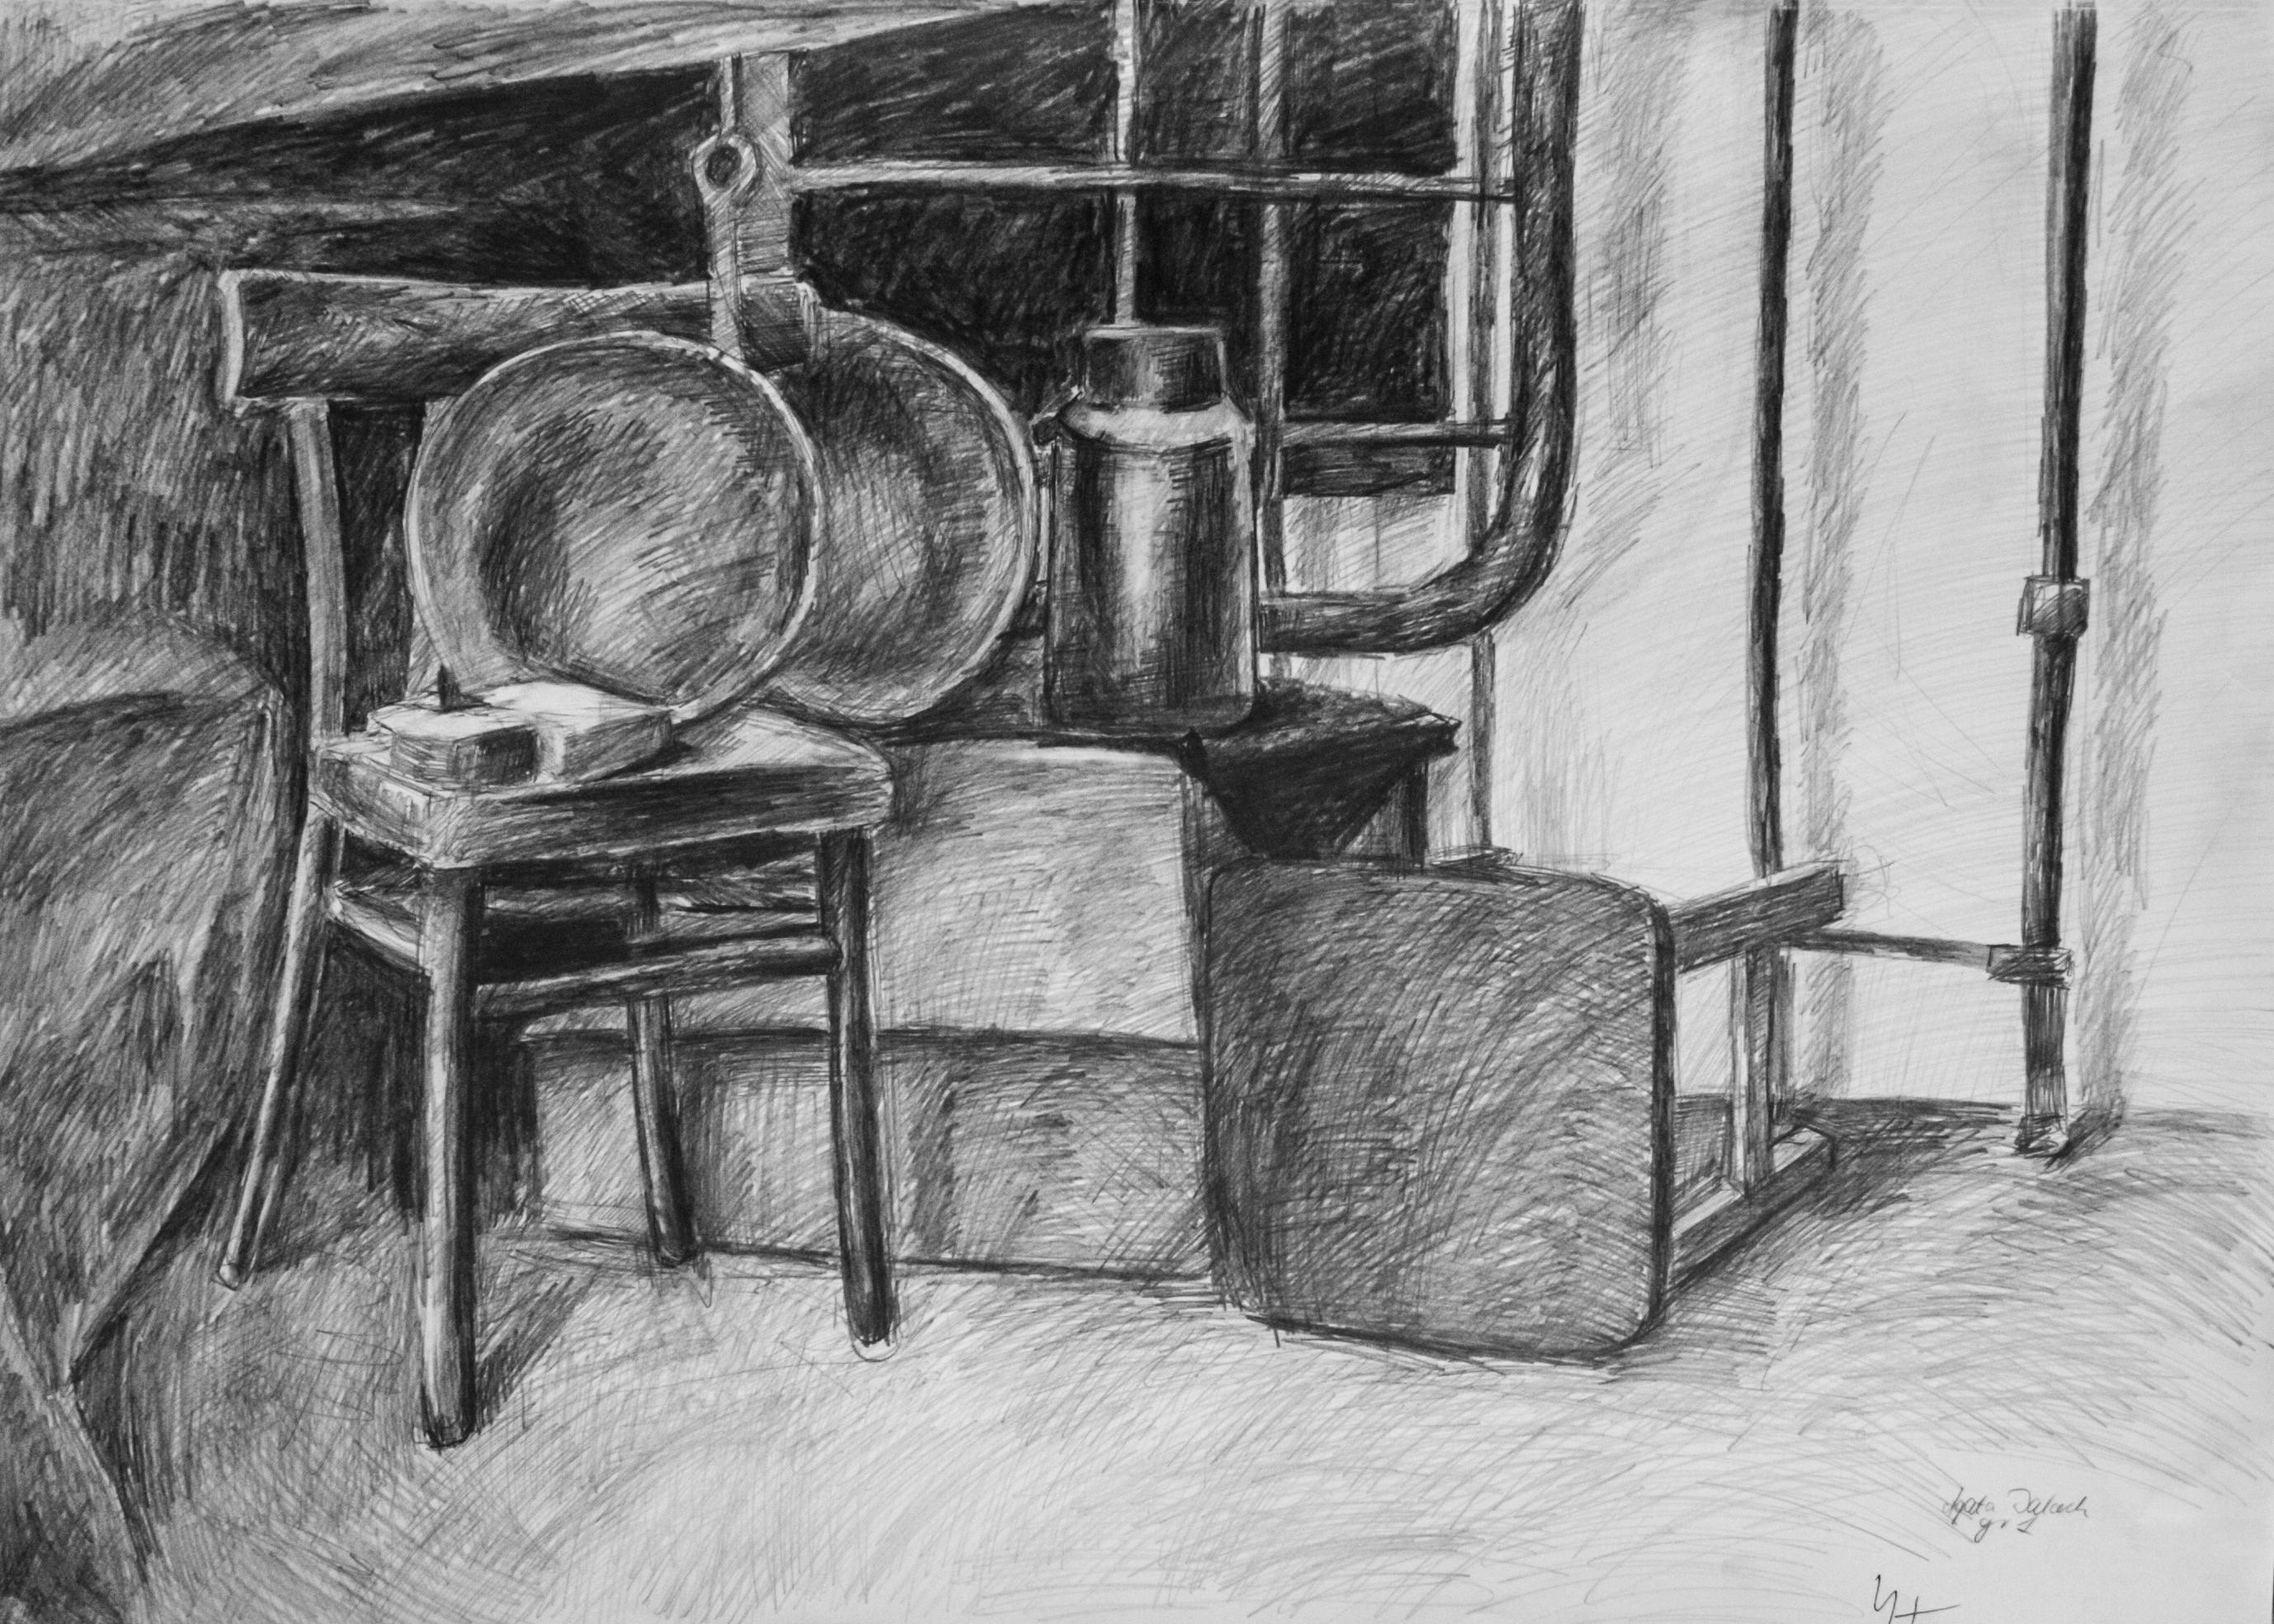 Darkness in the corner by Evanrinya